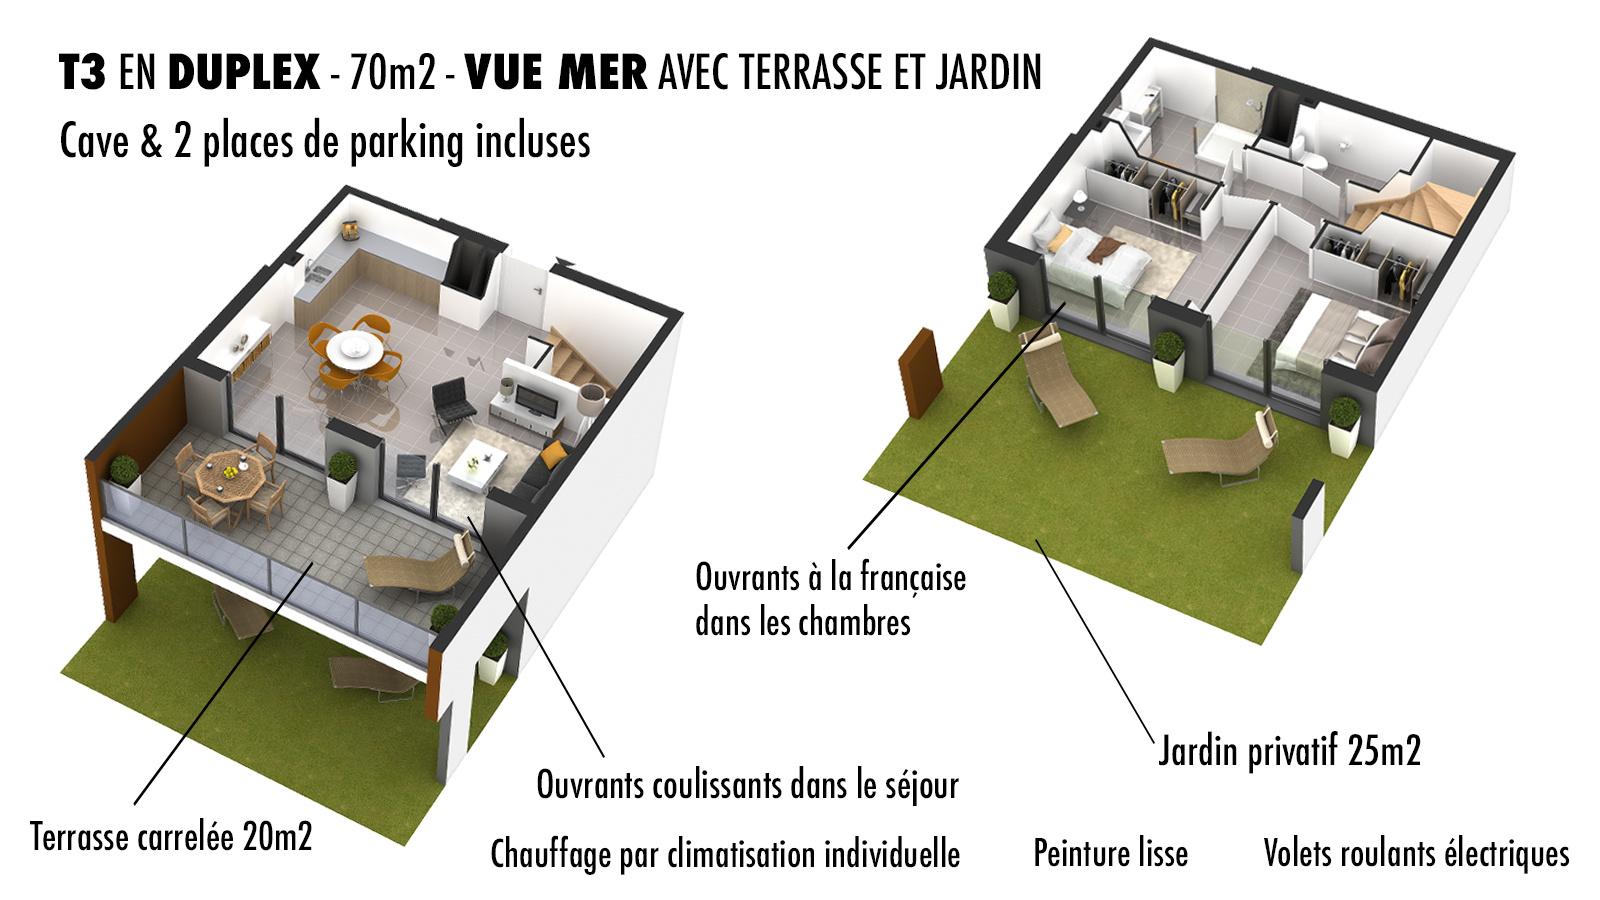 appartement vue mer poritccio plan 3D duplex